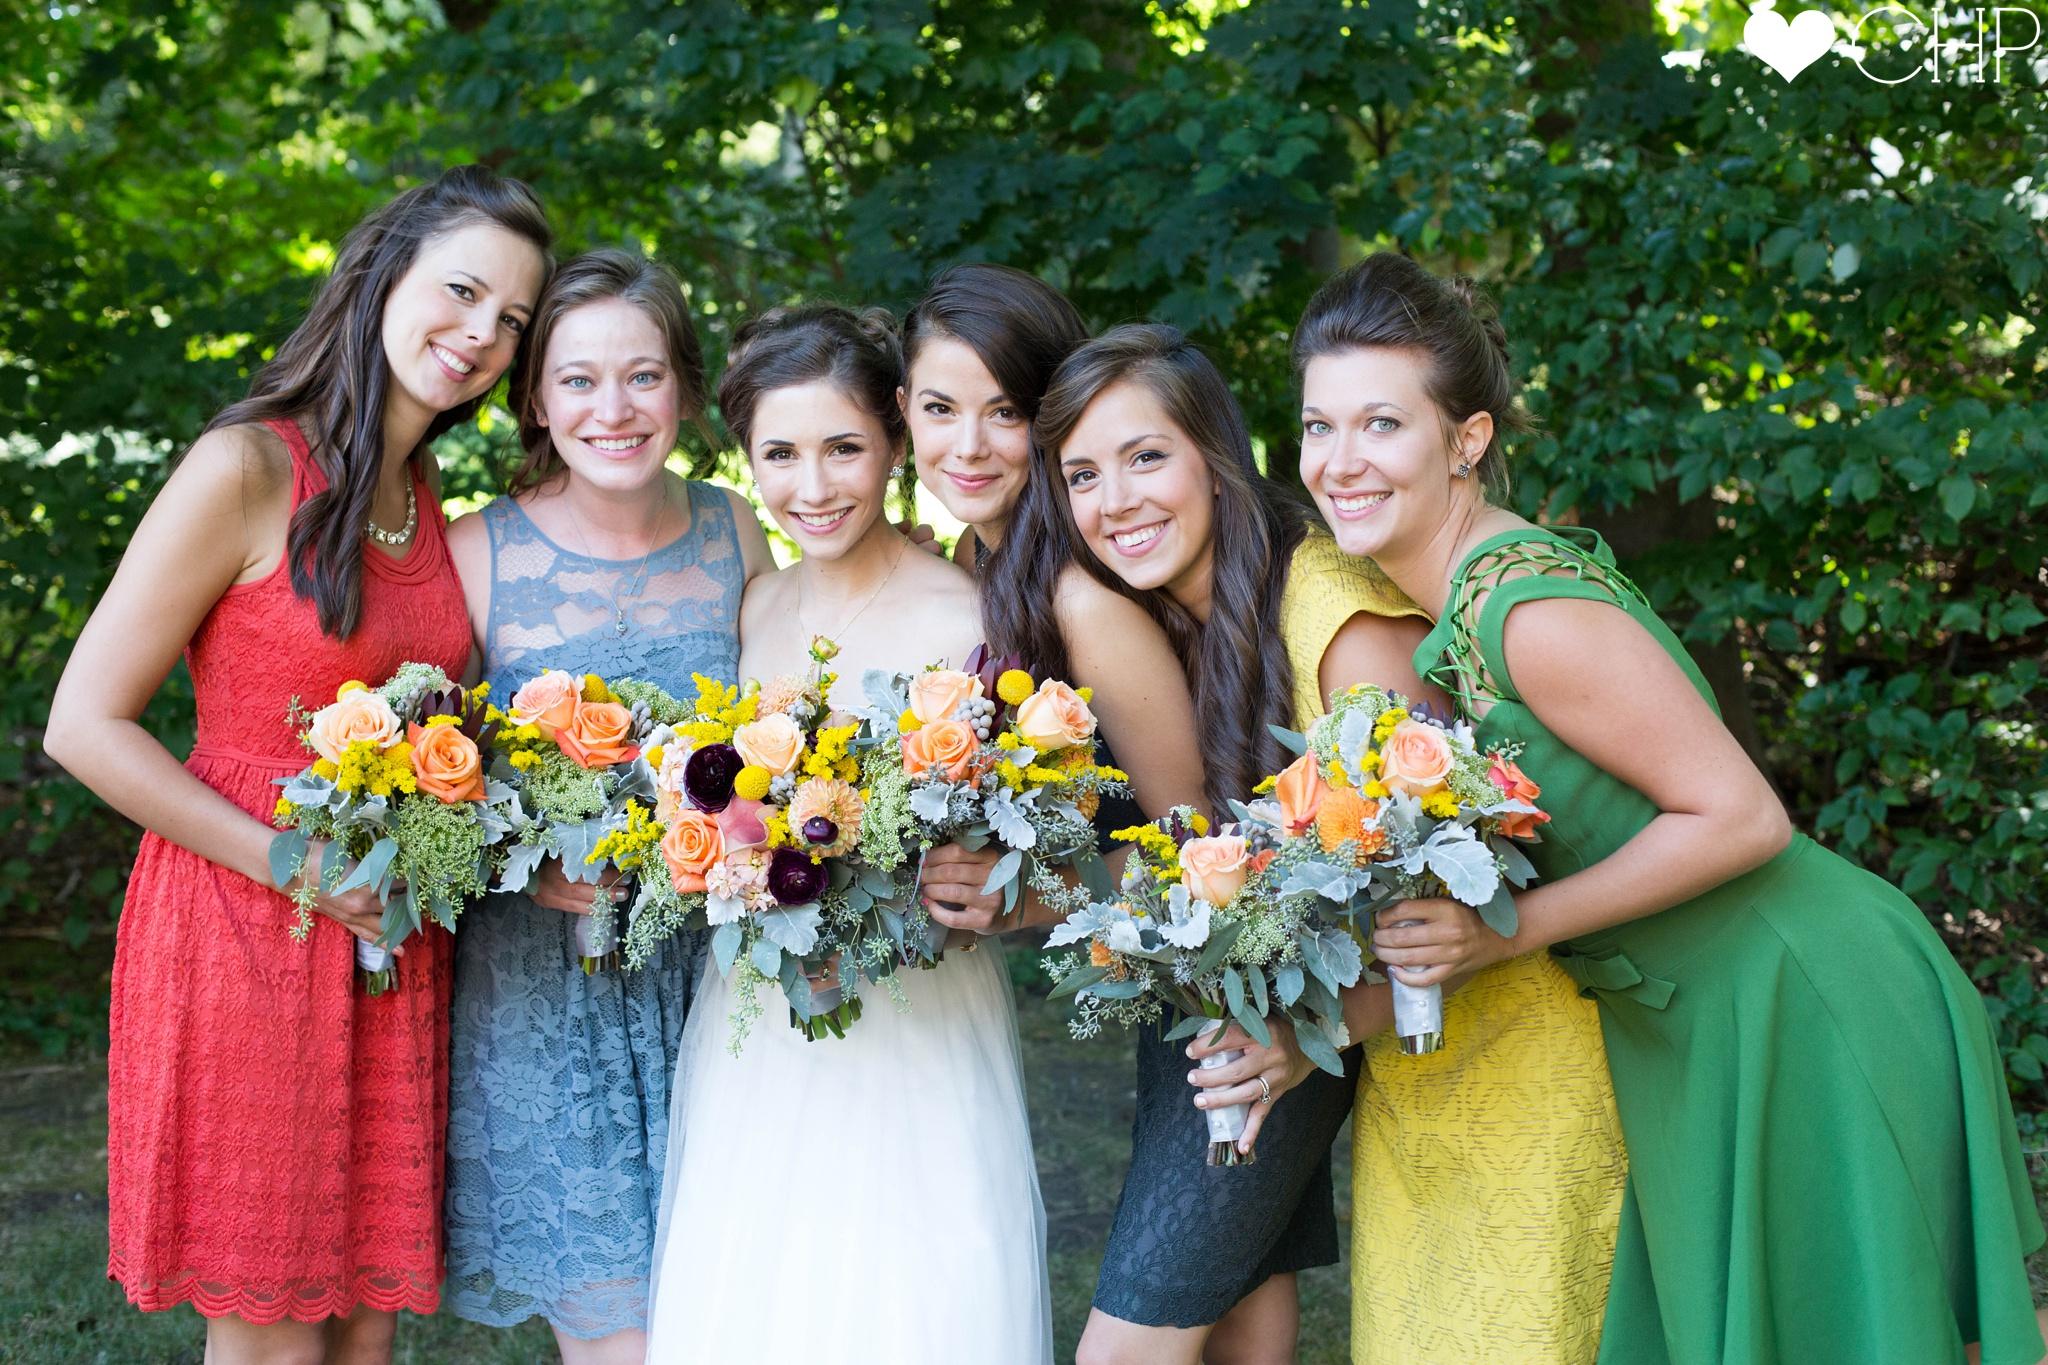 Bridesmaid-dress-inspiration